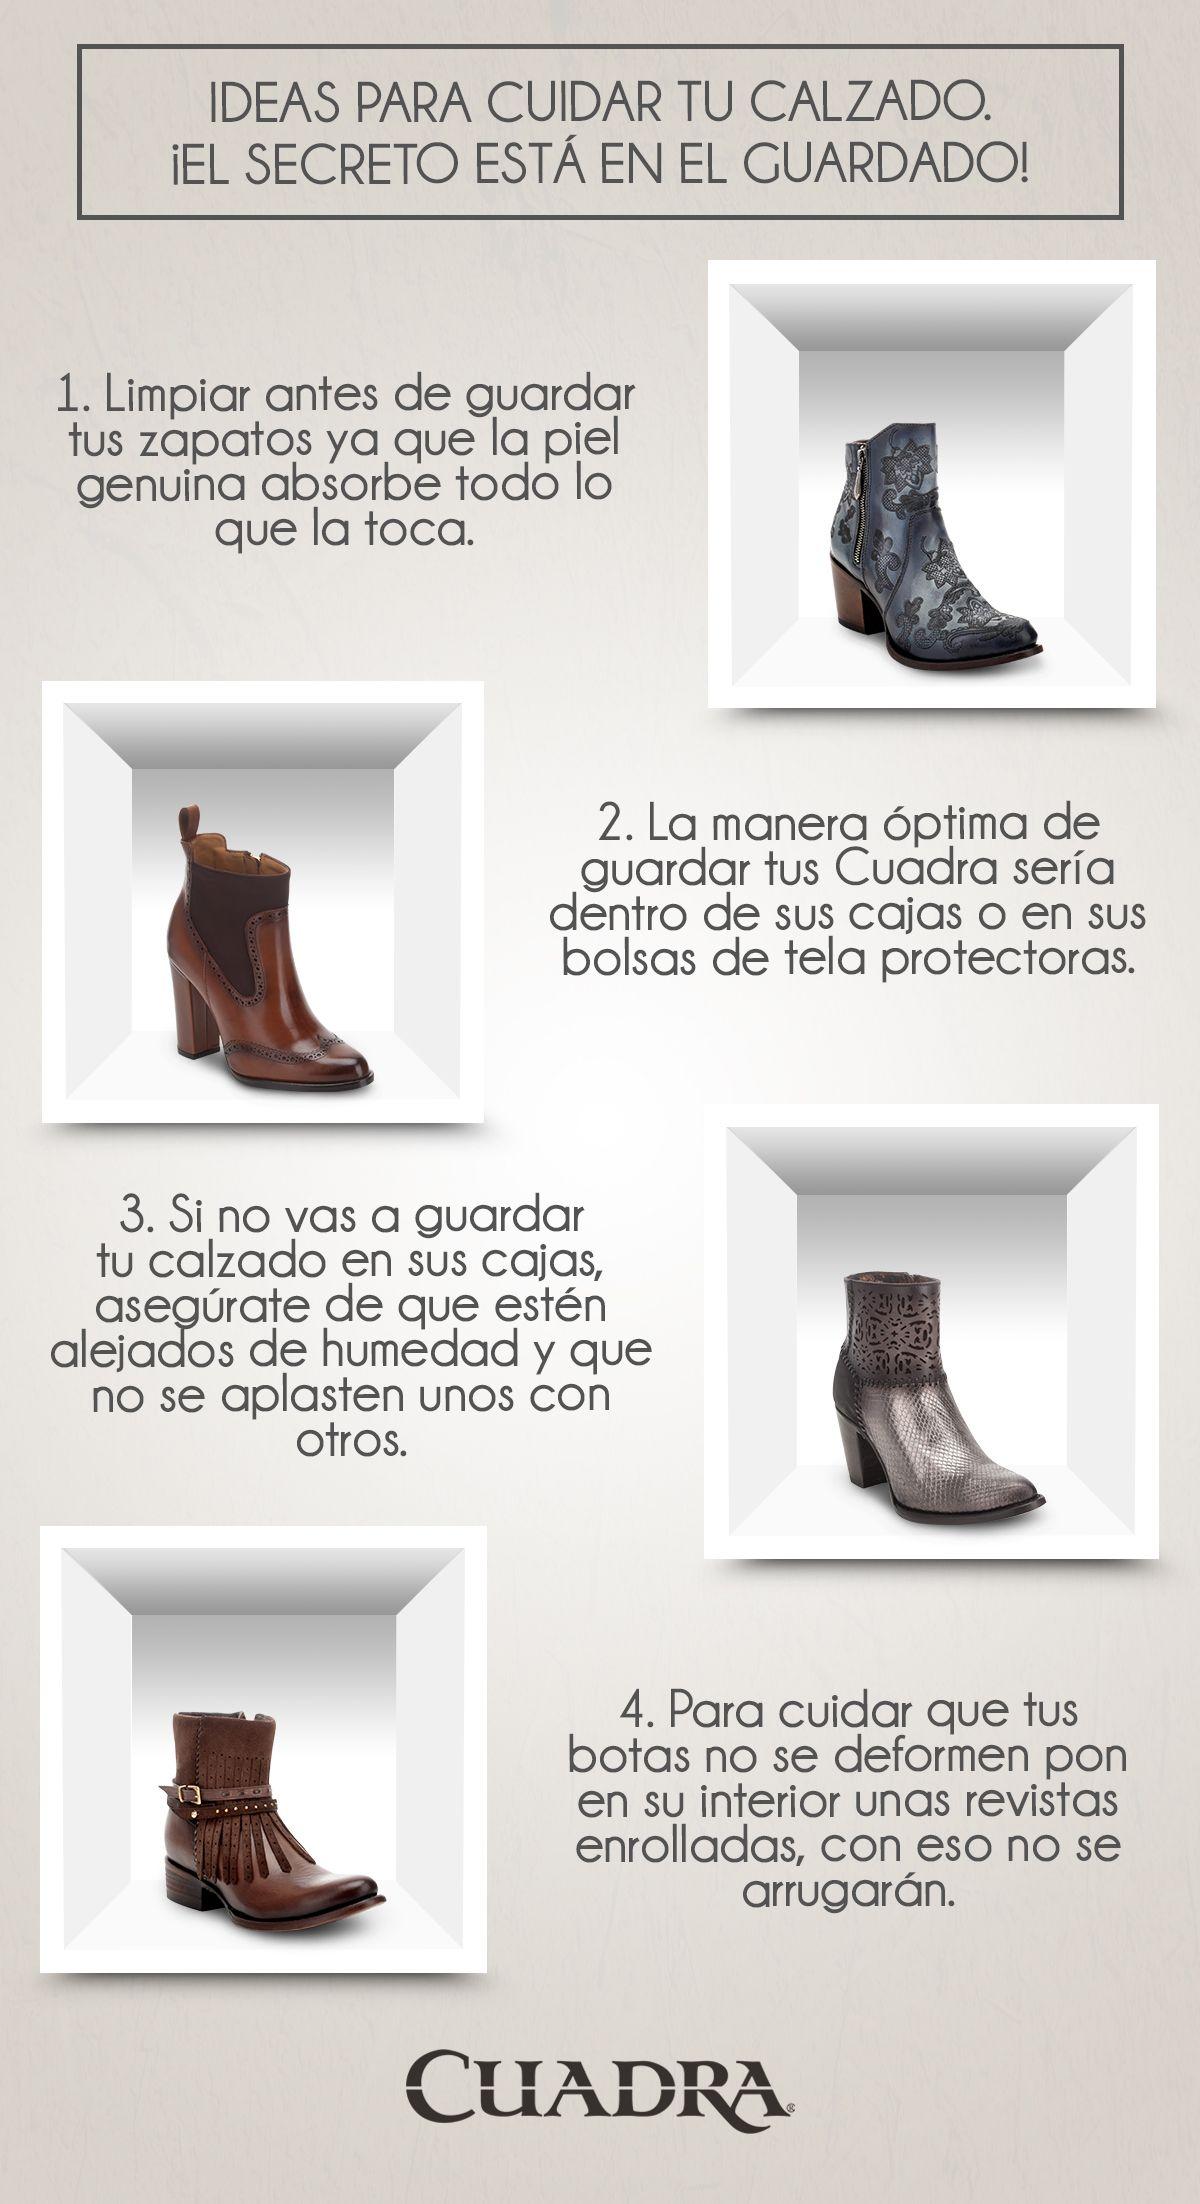 Ideas Para Cuidar Tu Calzado Cuadra Blog Cuadra Calzas Jeans Y Botas Botas Zapatos